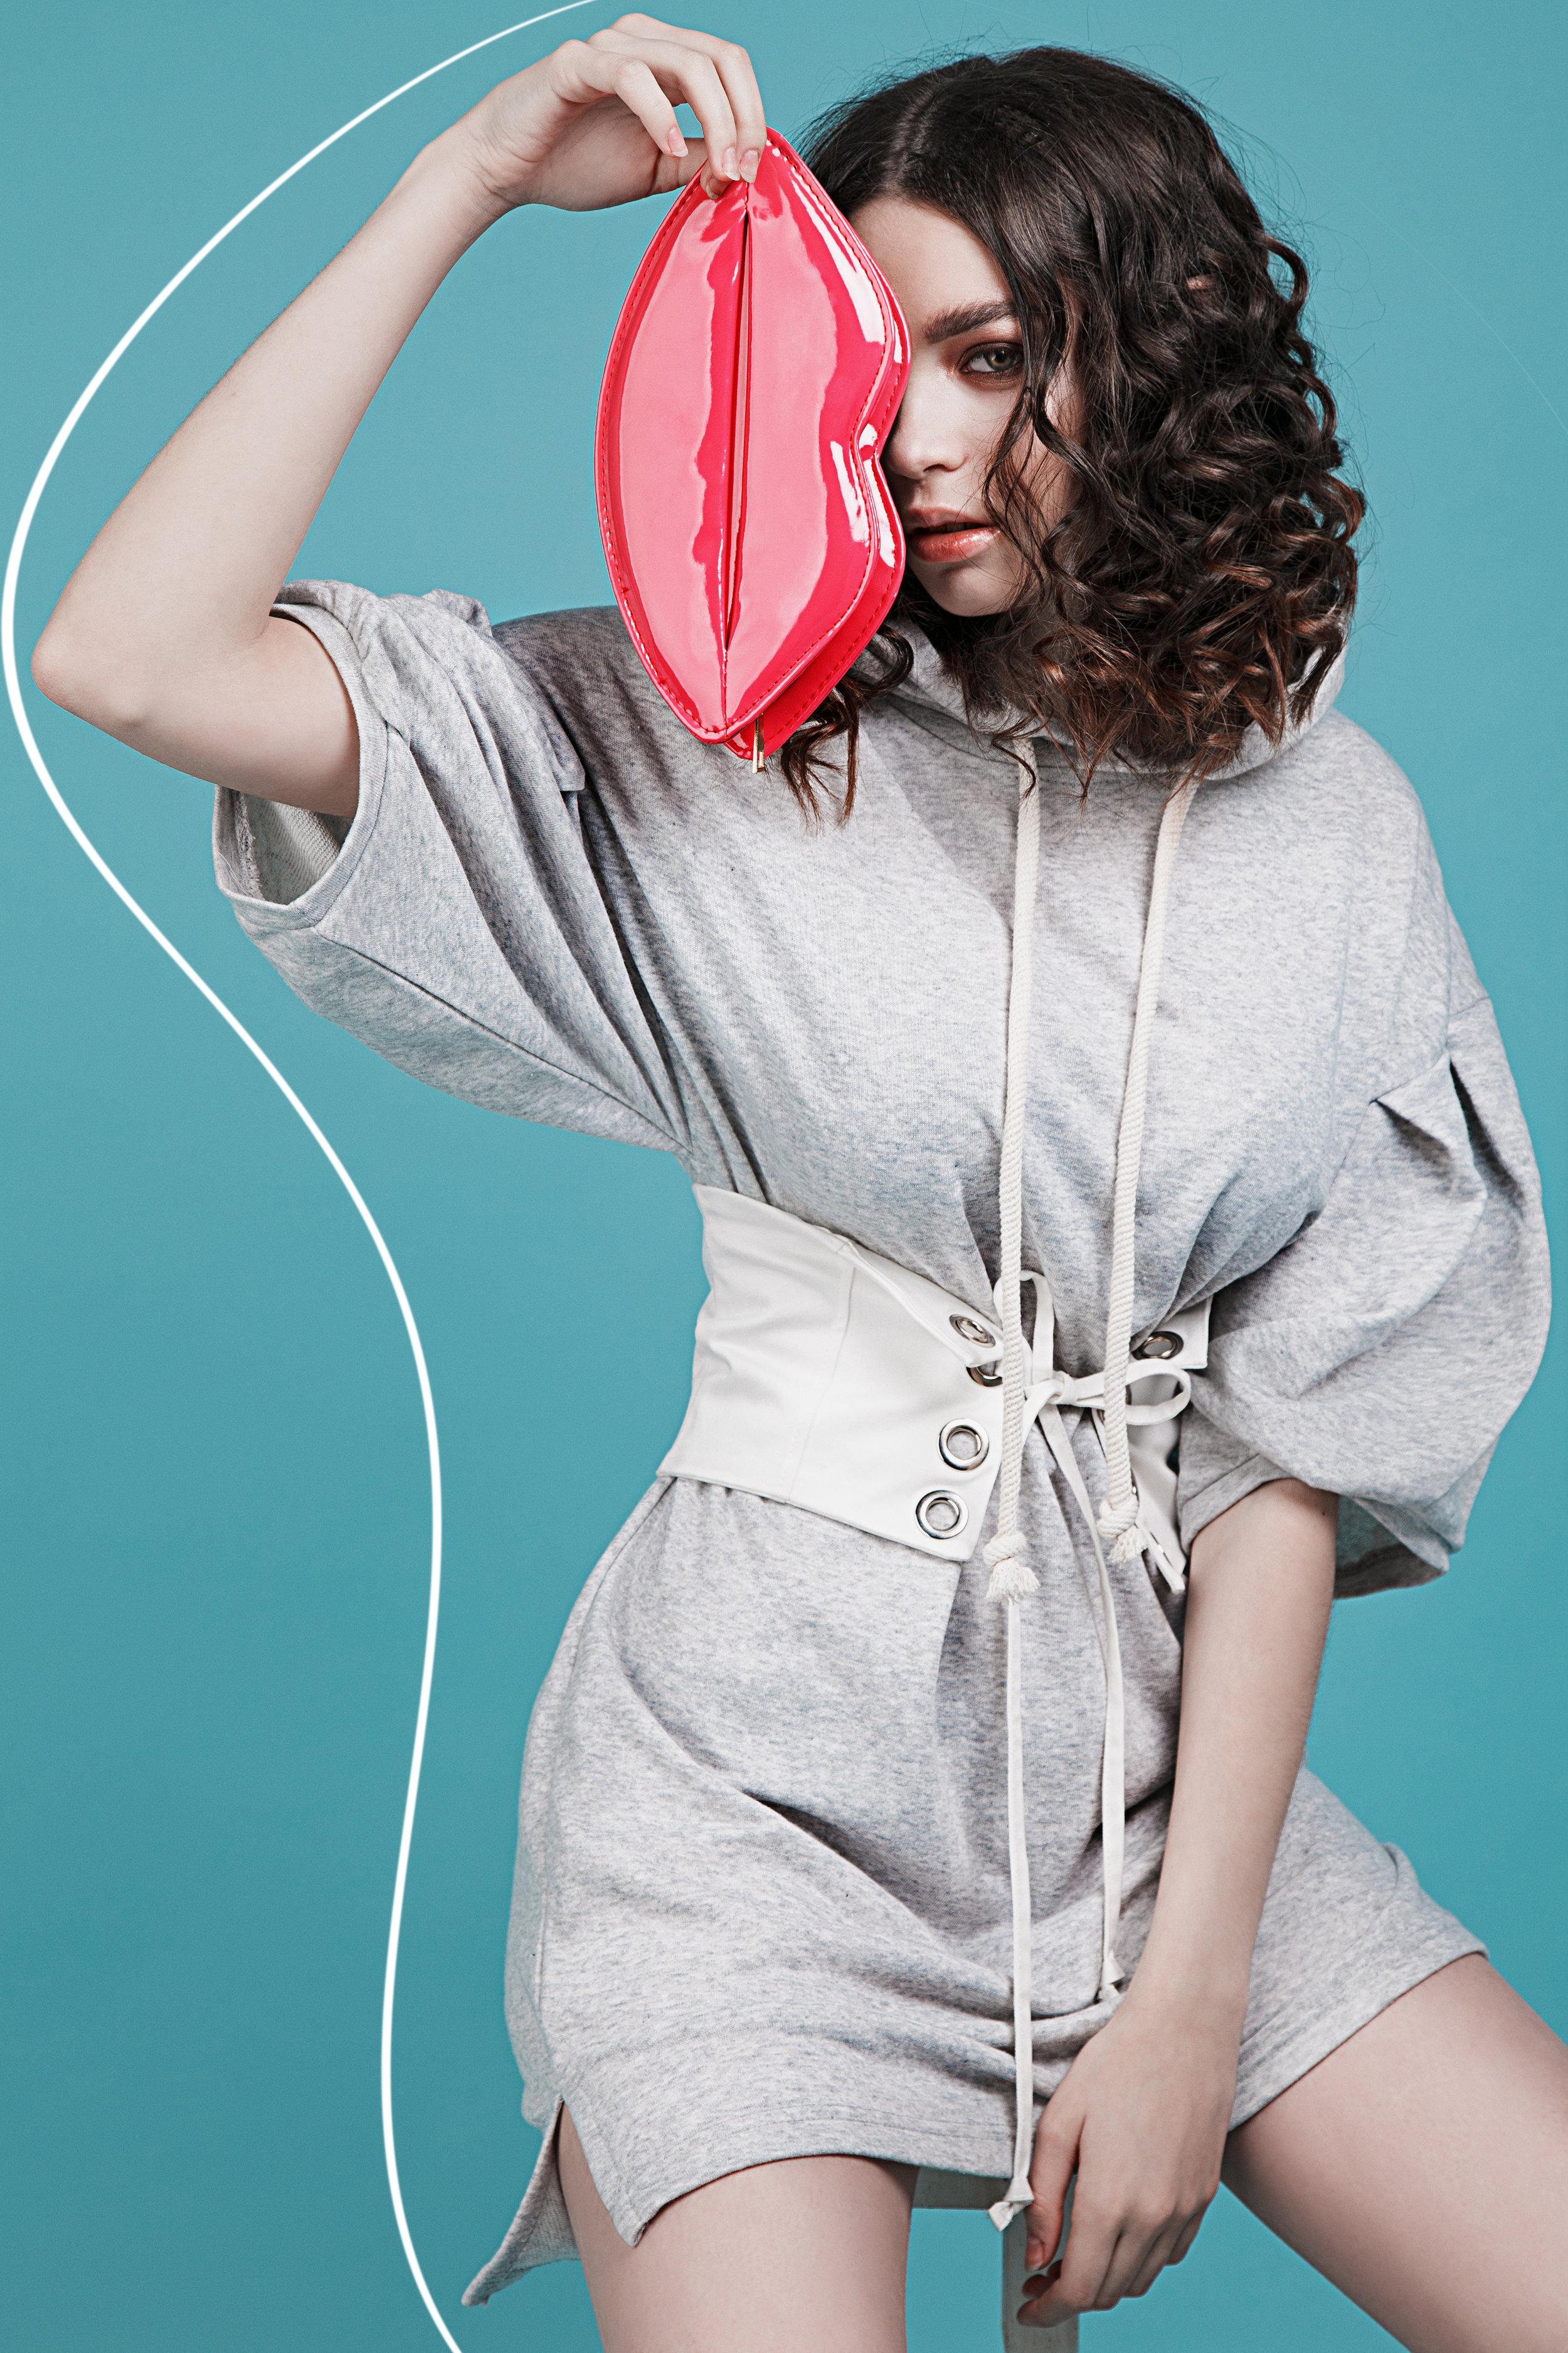 Sweatshirt Bershka, Corset-belt Zara, bag Lady Collection